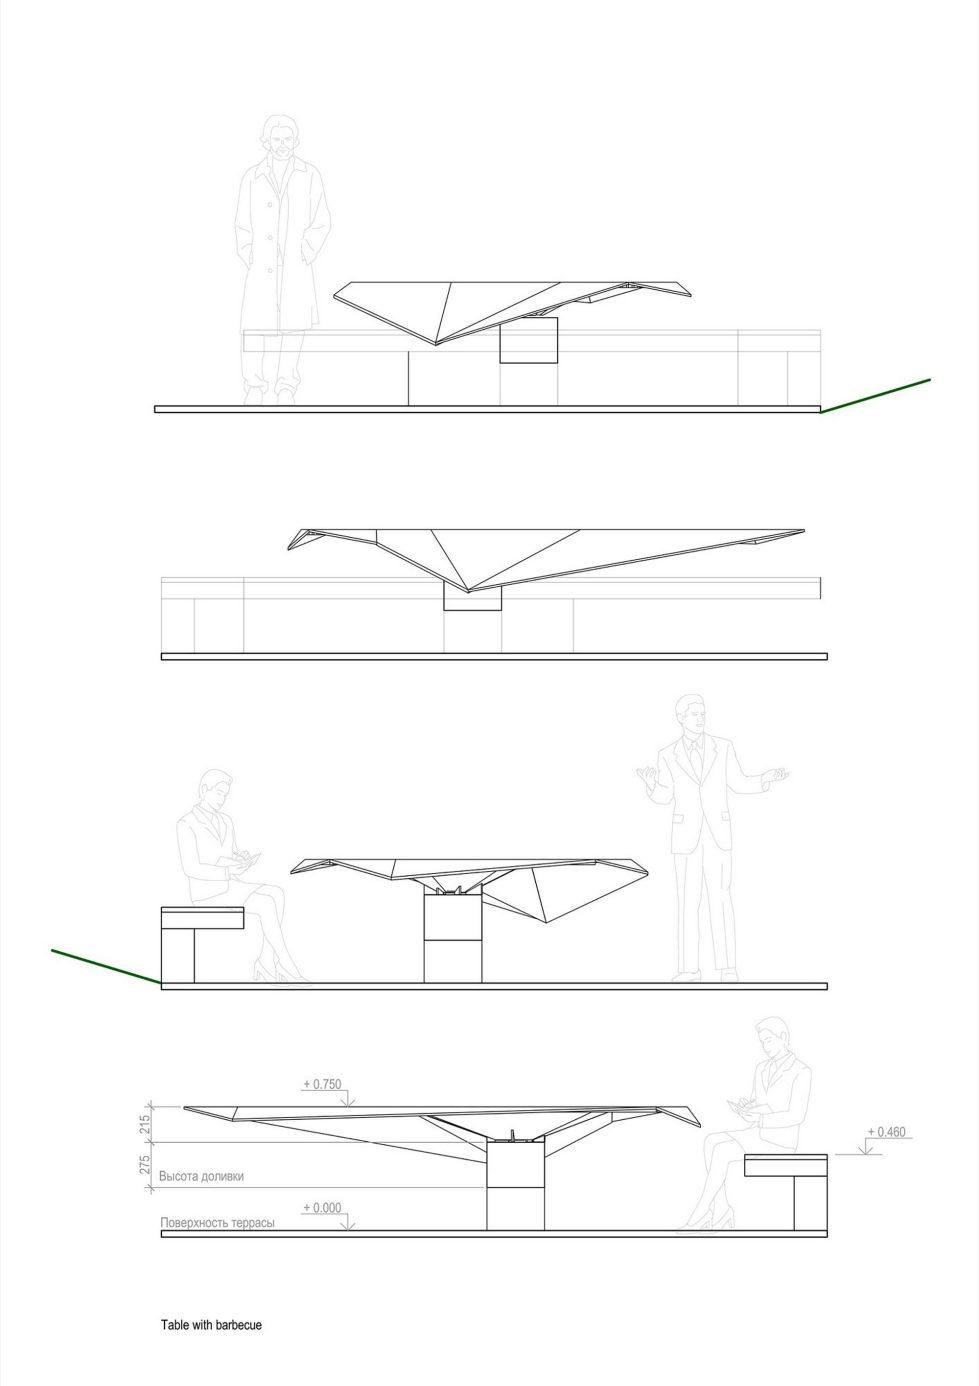 house-a-the-functional-minimalism-by-igor-petrenko-plan-10